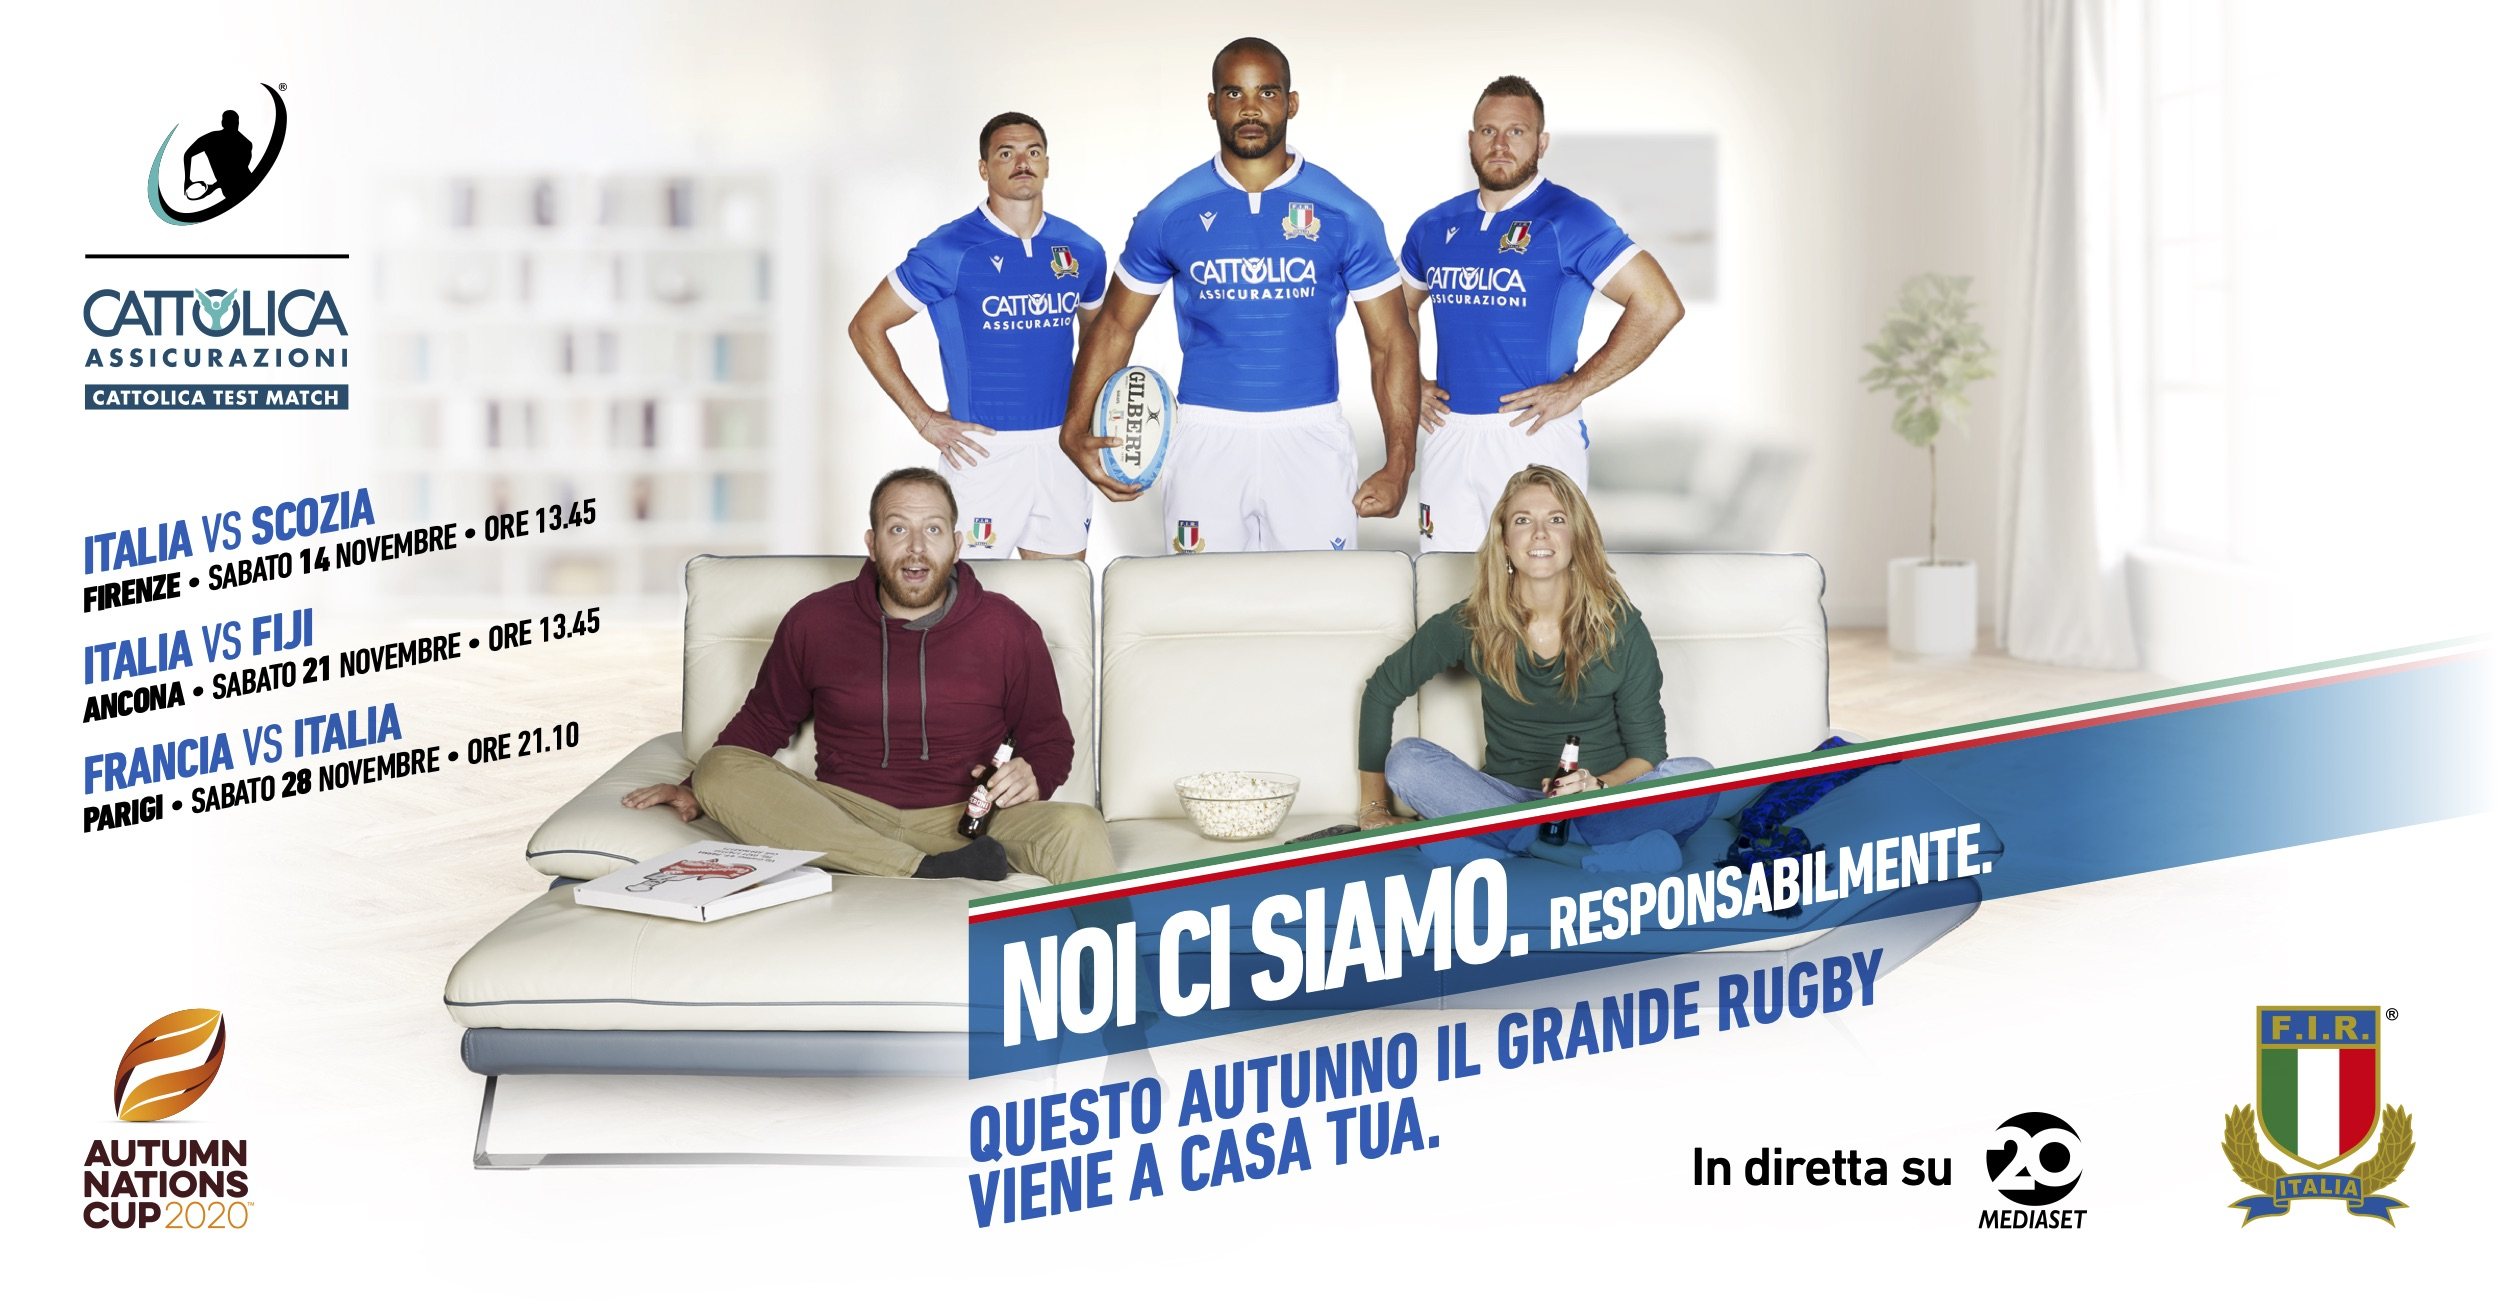 Rugby Autumn Nations Cup con gli azzurri (diretta Mediaset Canale 20)